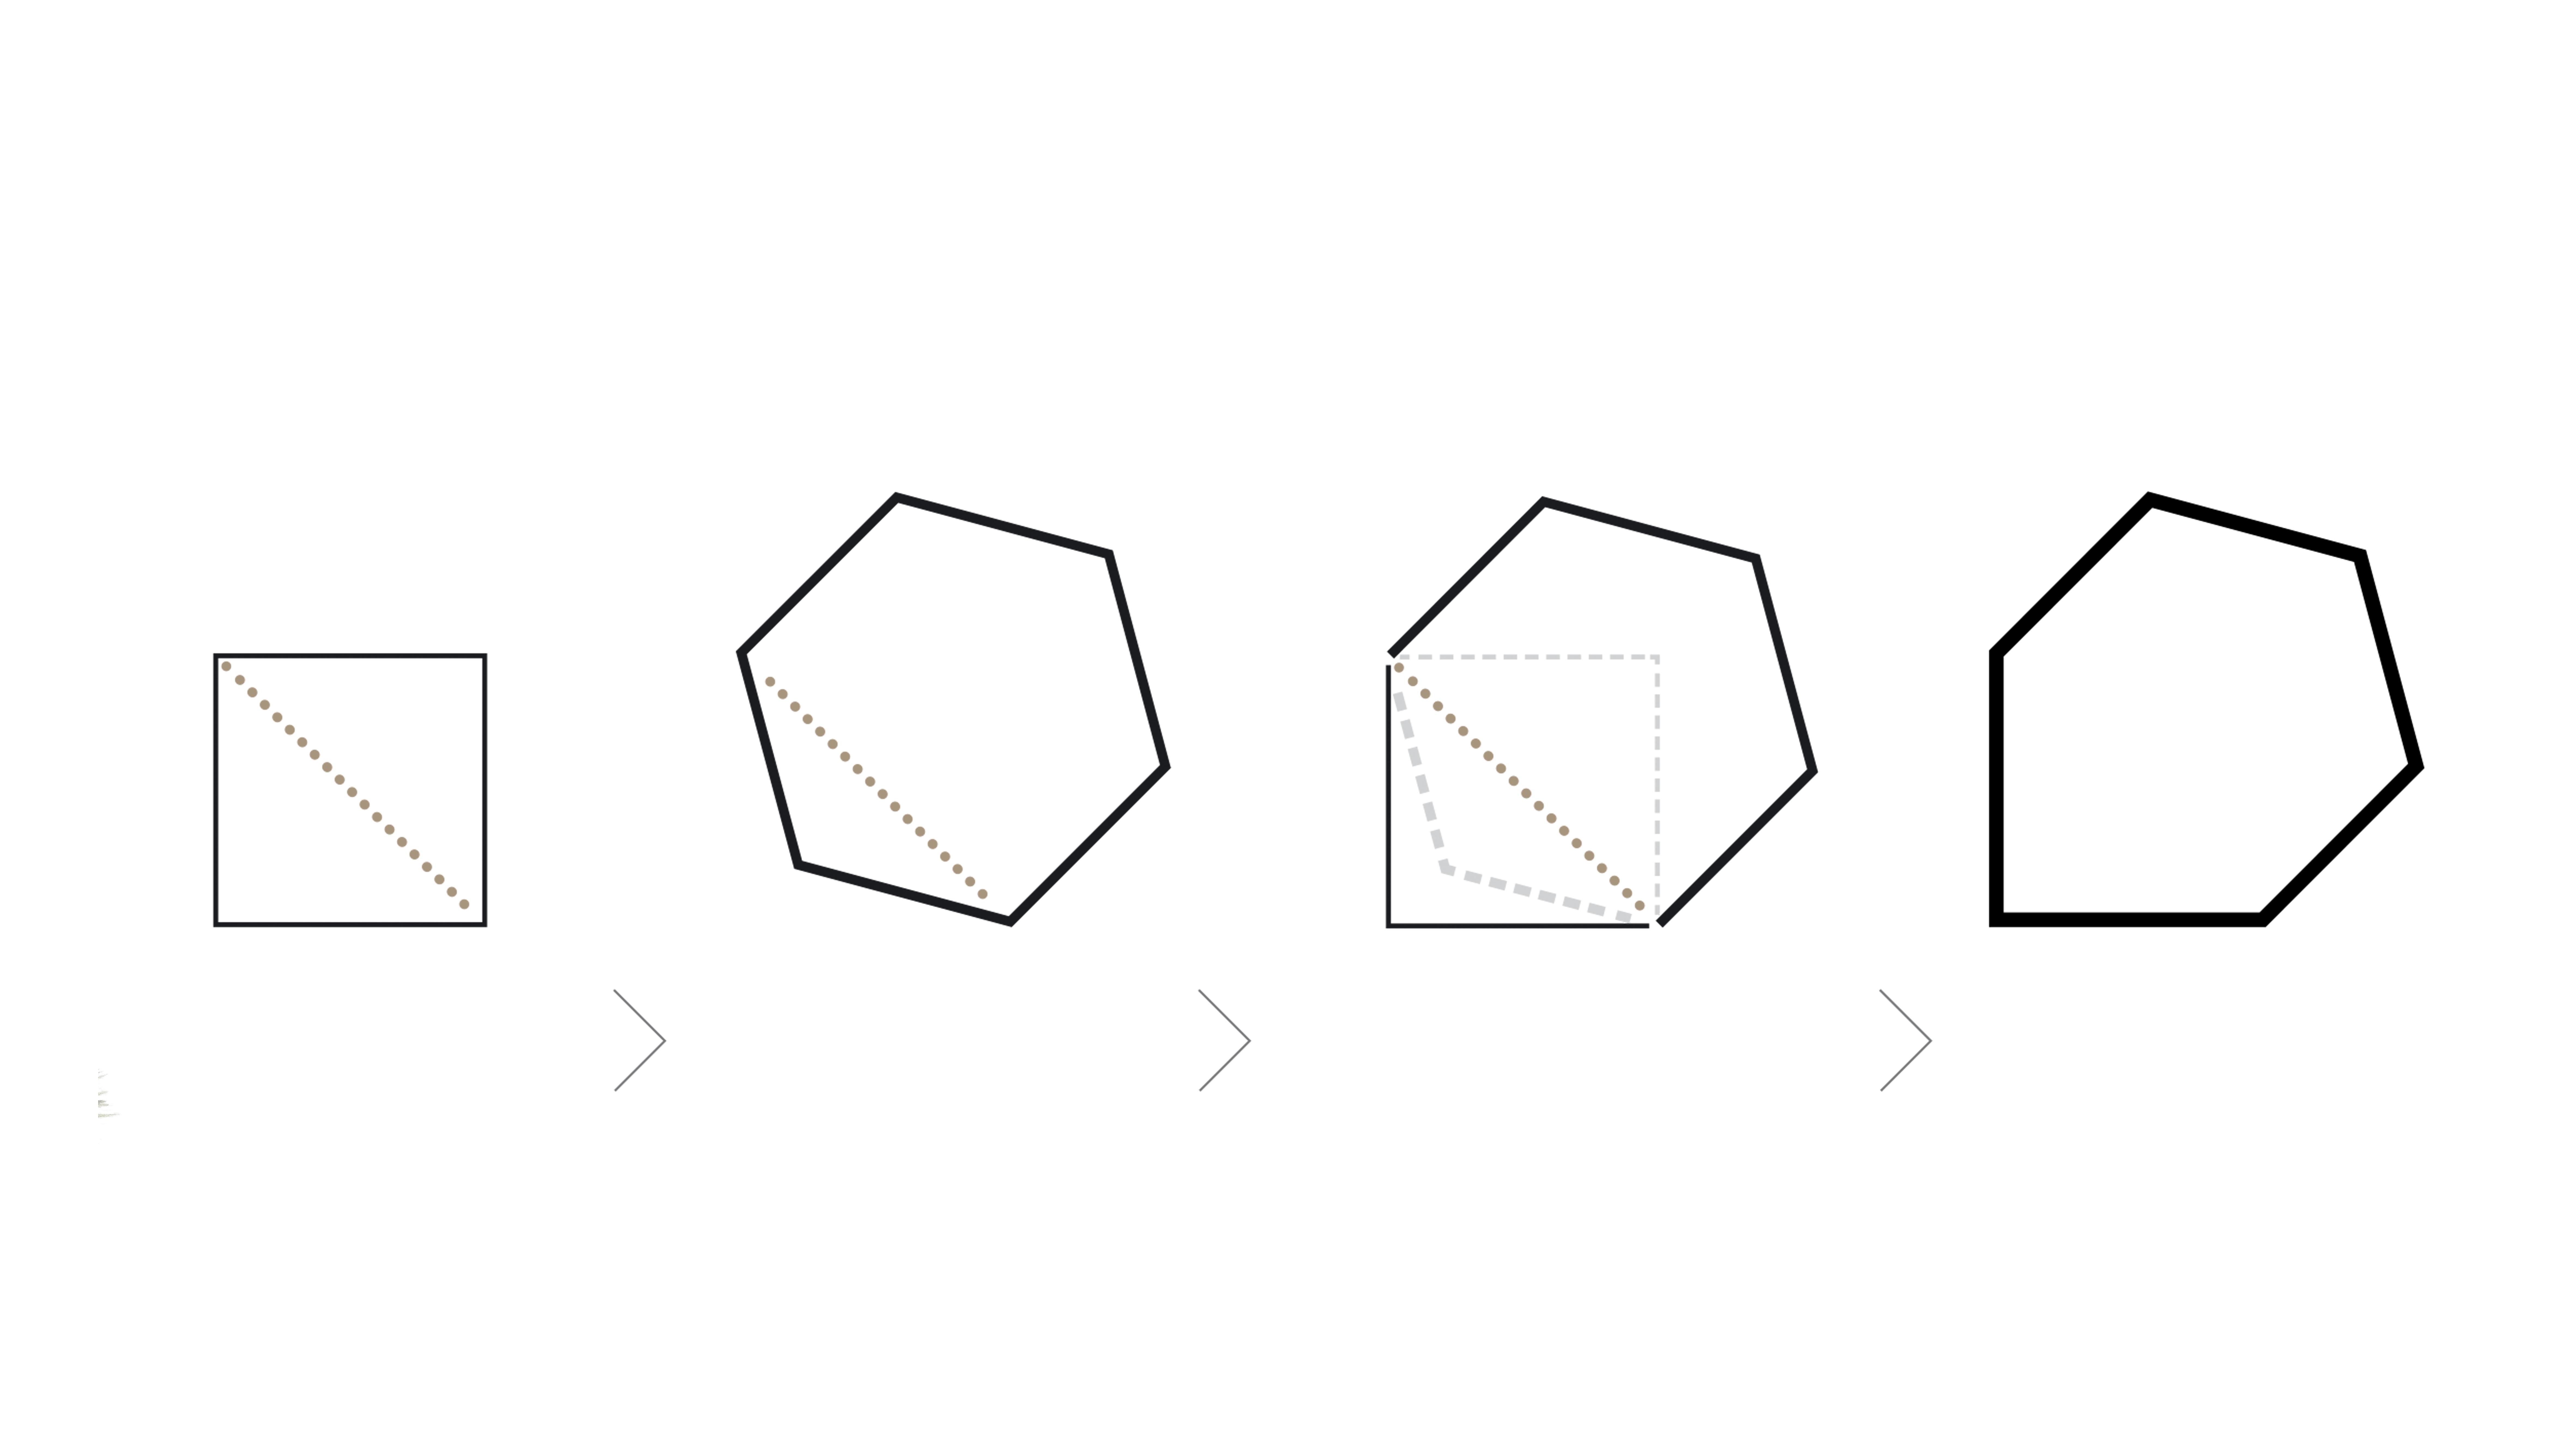 C:UsersalejandroDesktopLANZAROTEPROYECTO4 Layout1 (1)